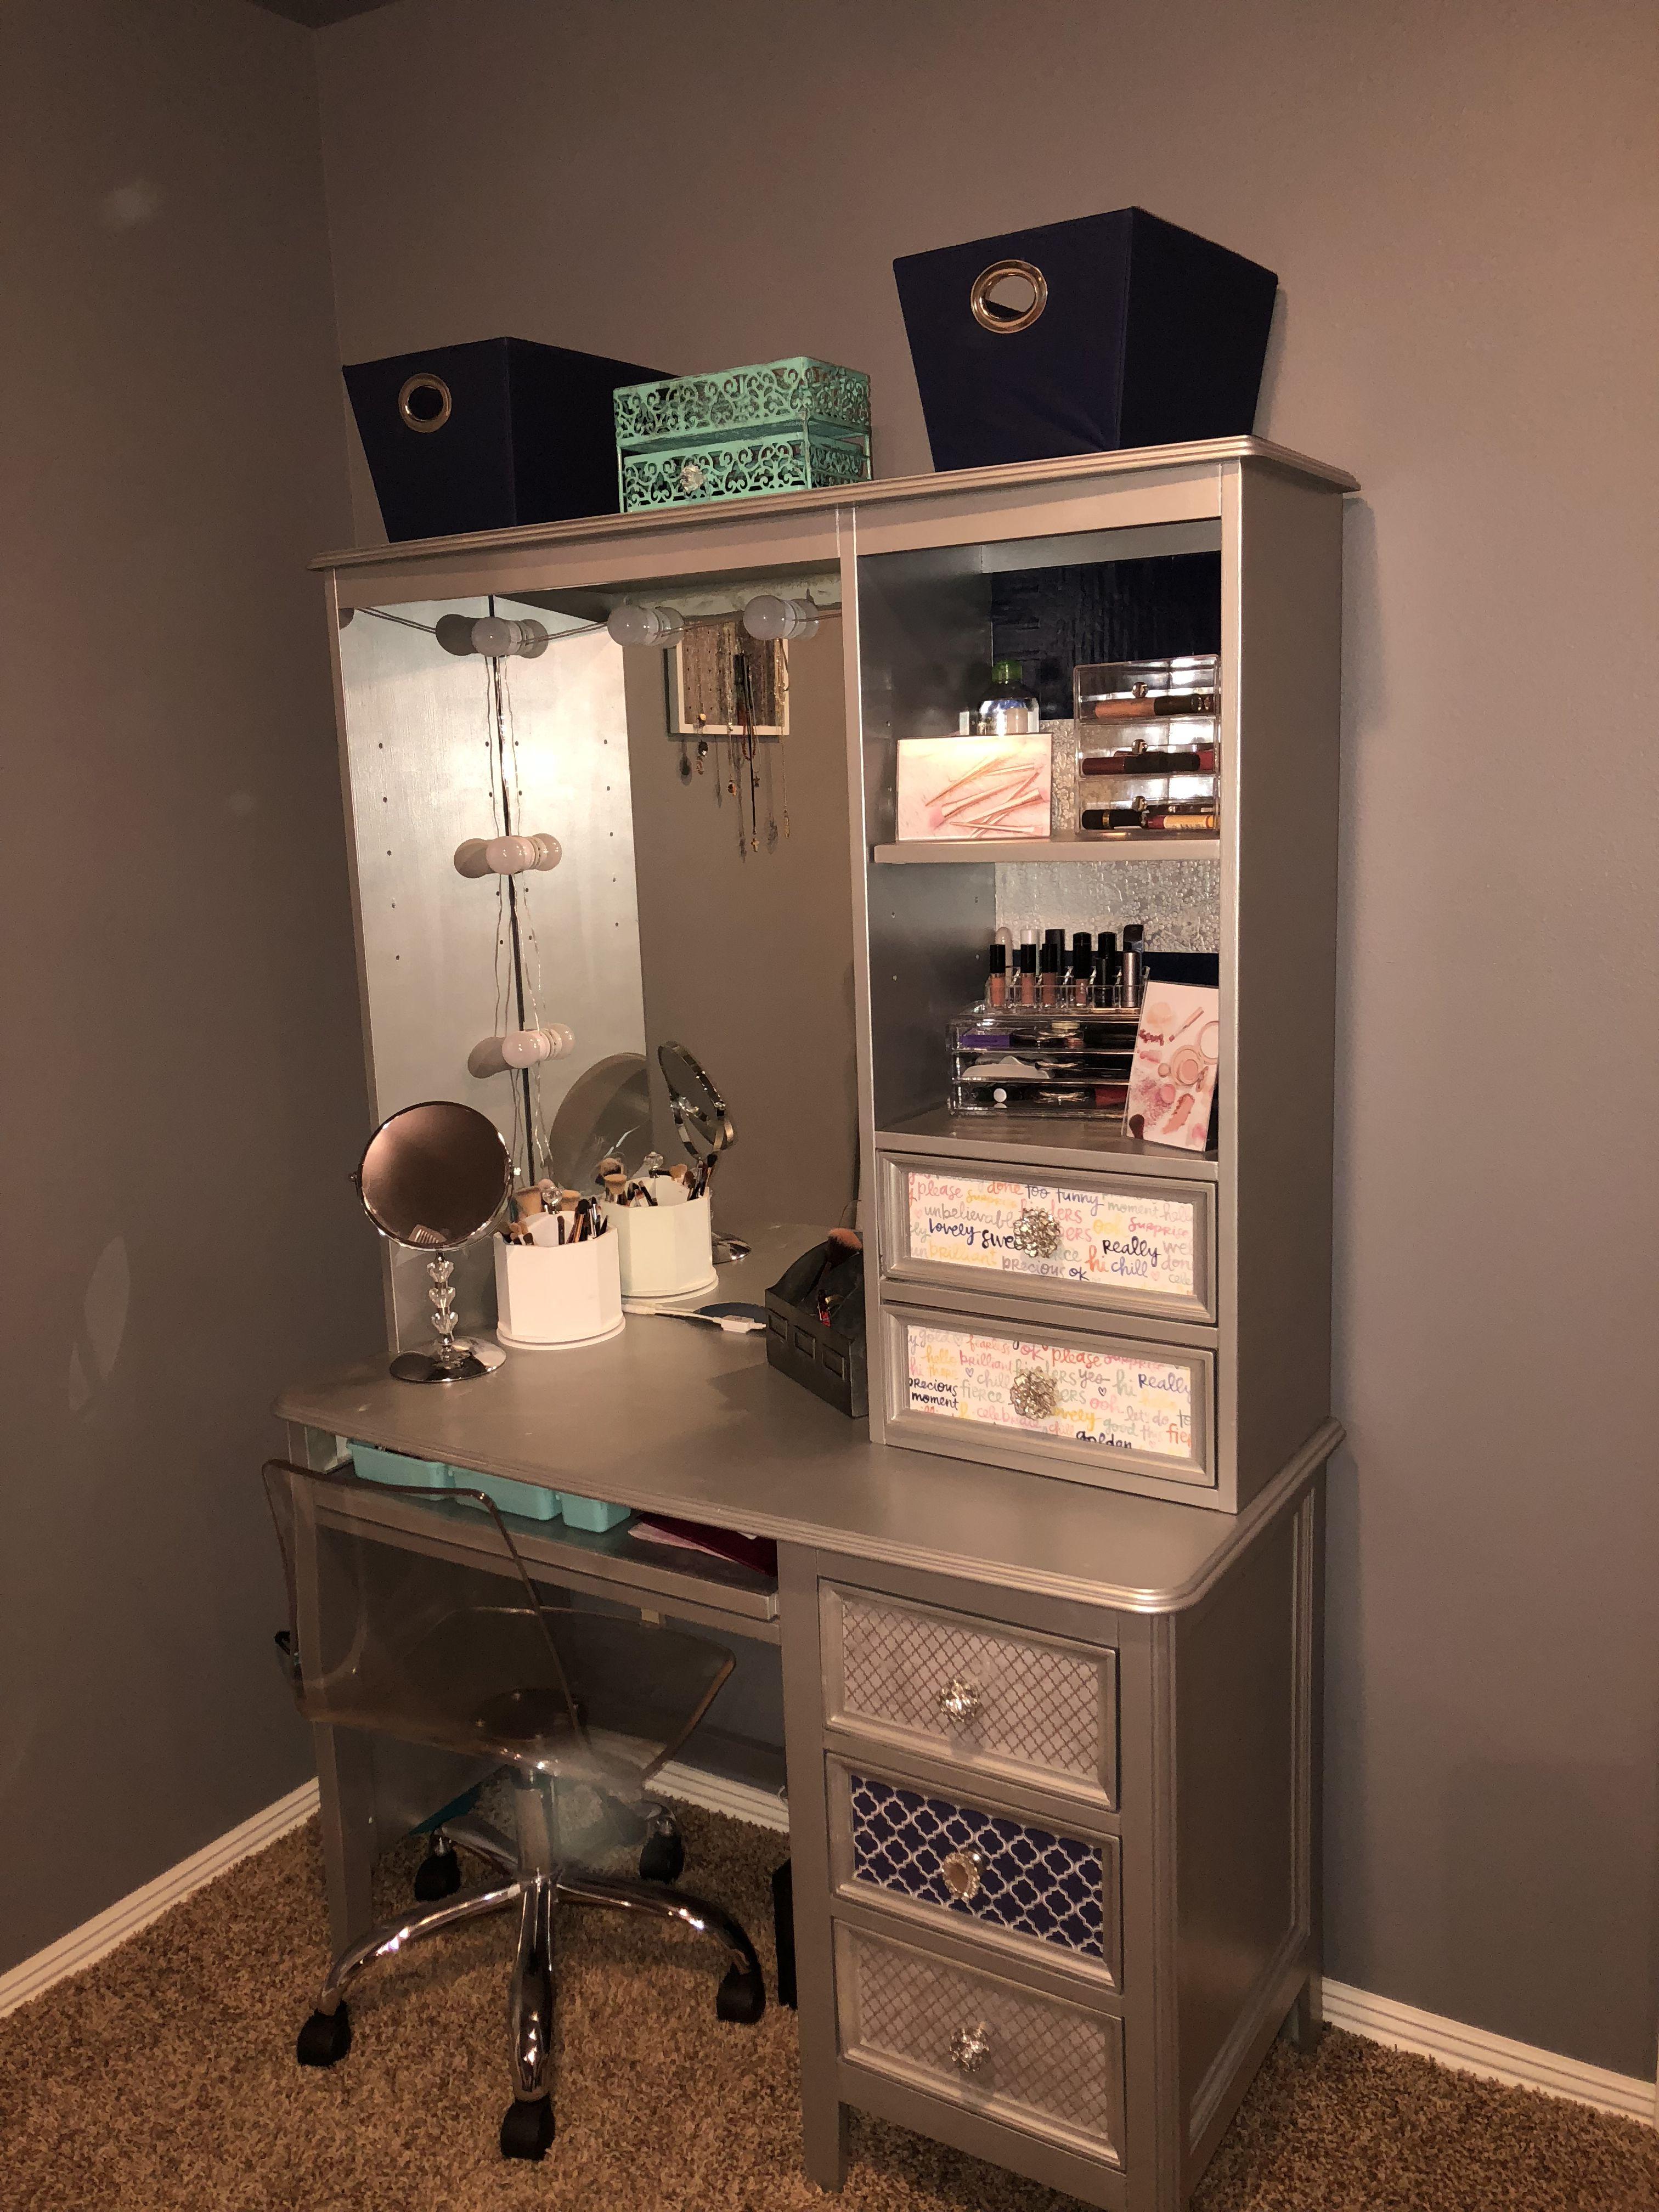 From Computer Desk To Makeup Vanity In 2019 Desk To